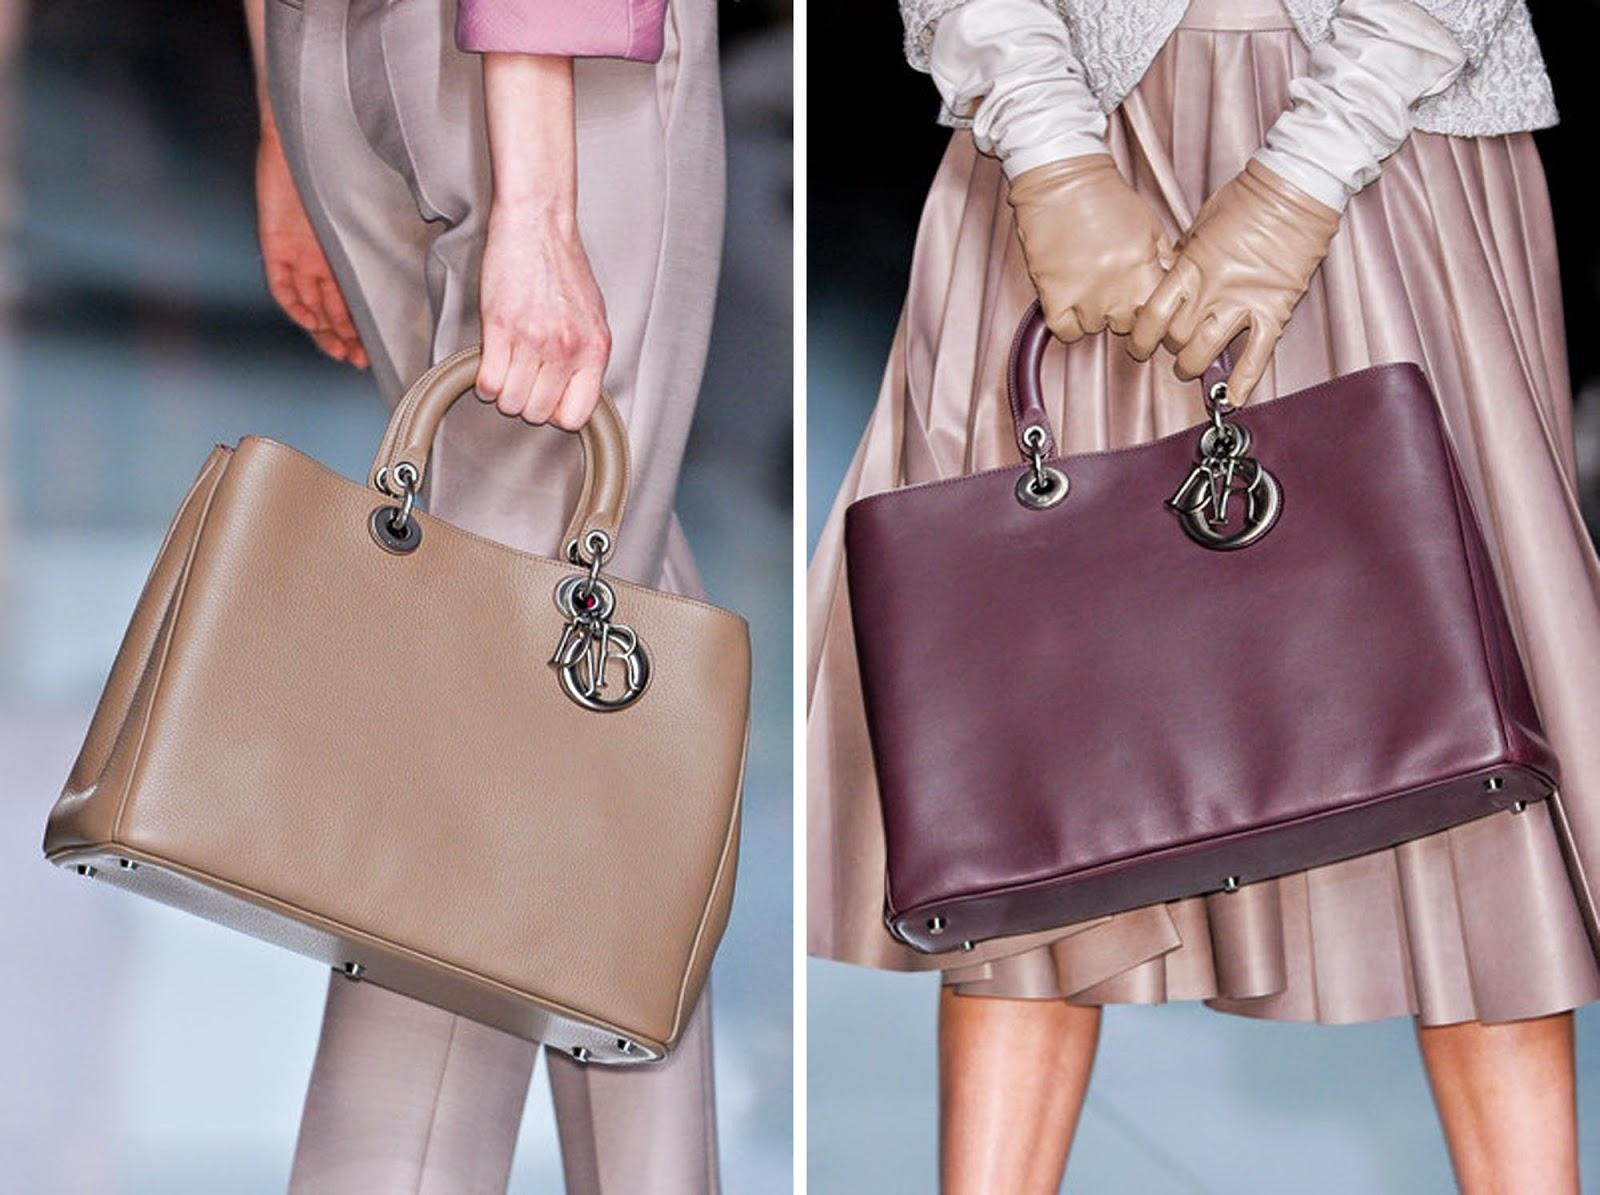 Fashion Designer Handbags - Christian Dior Handbags